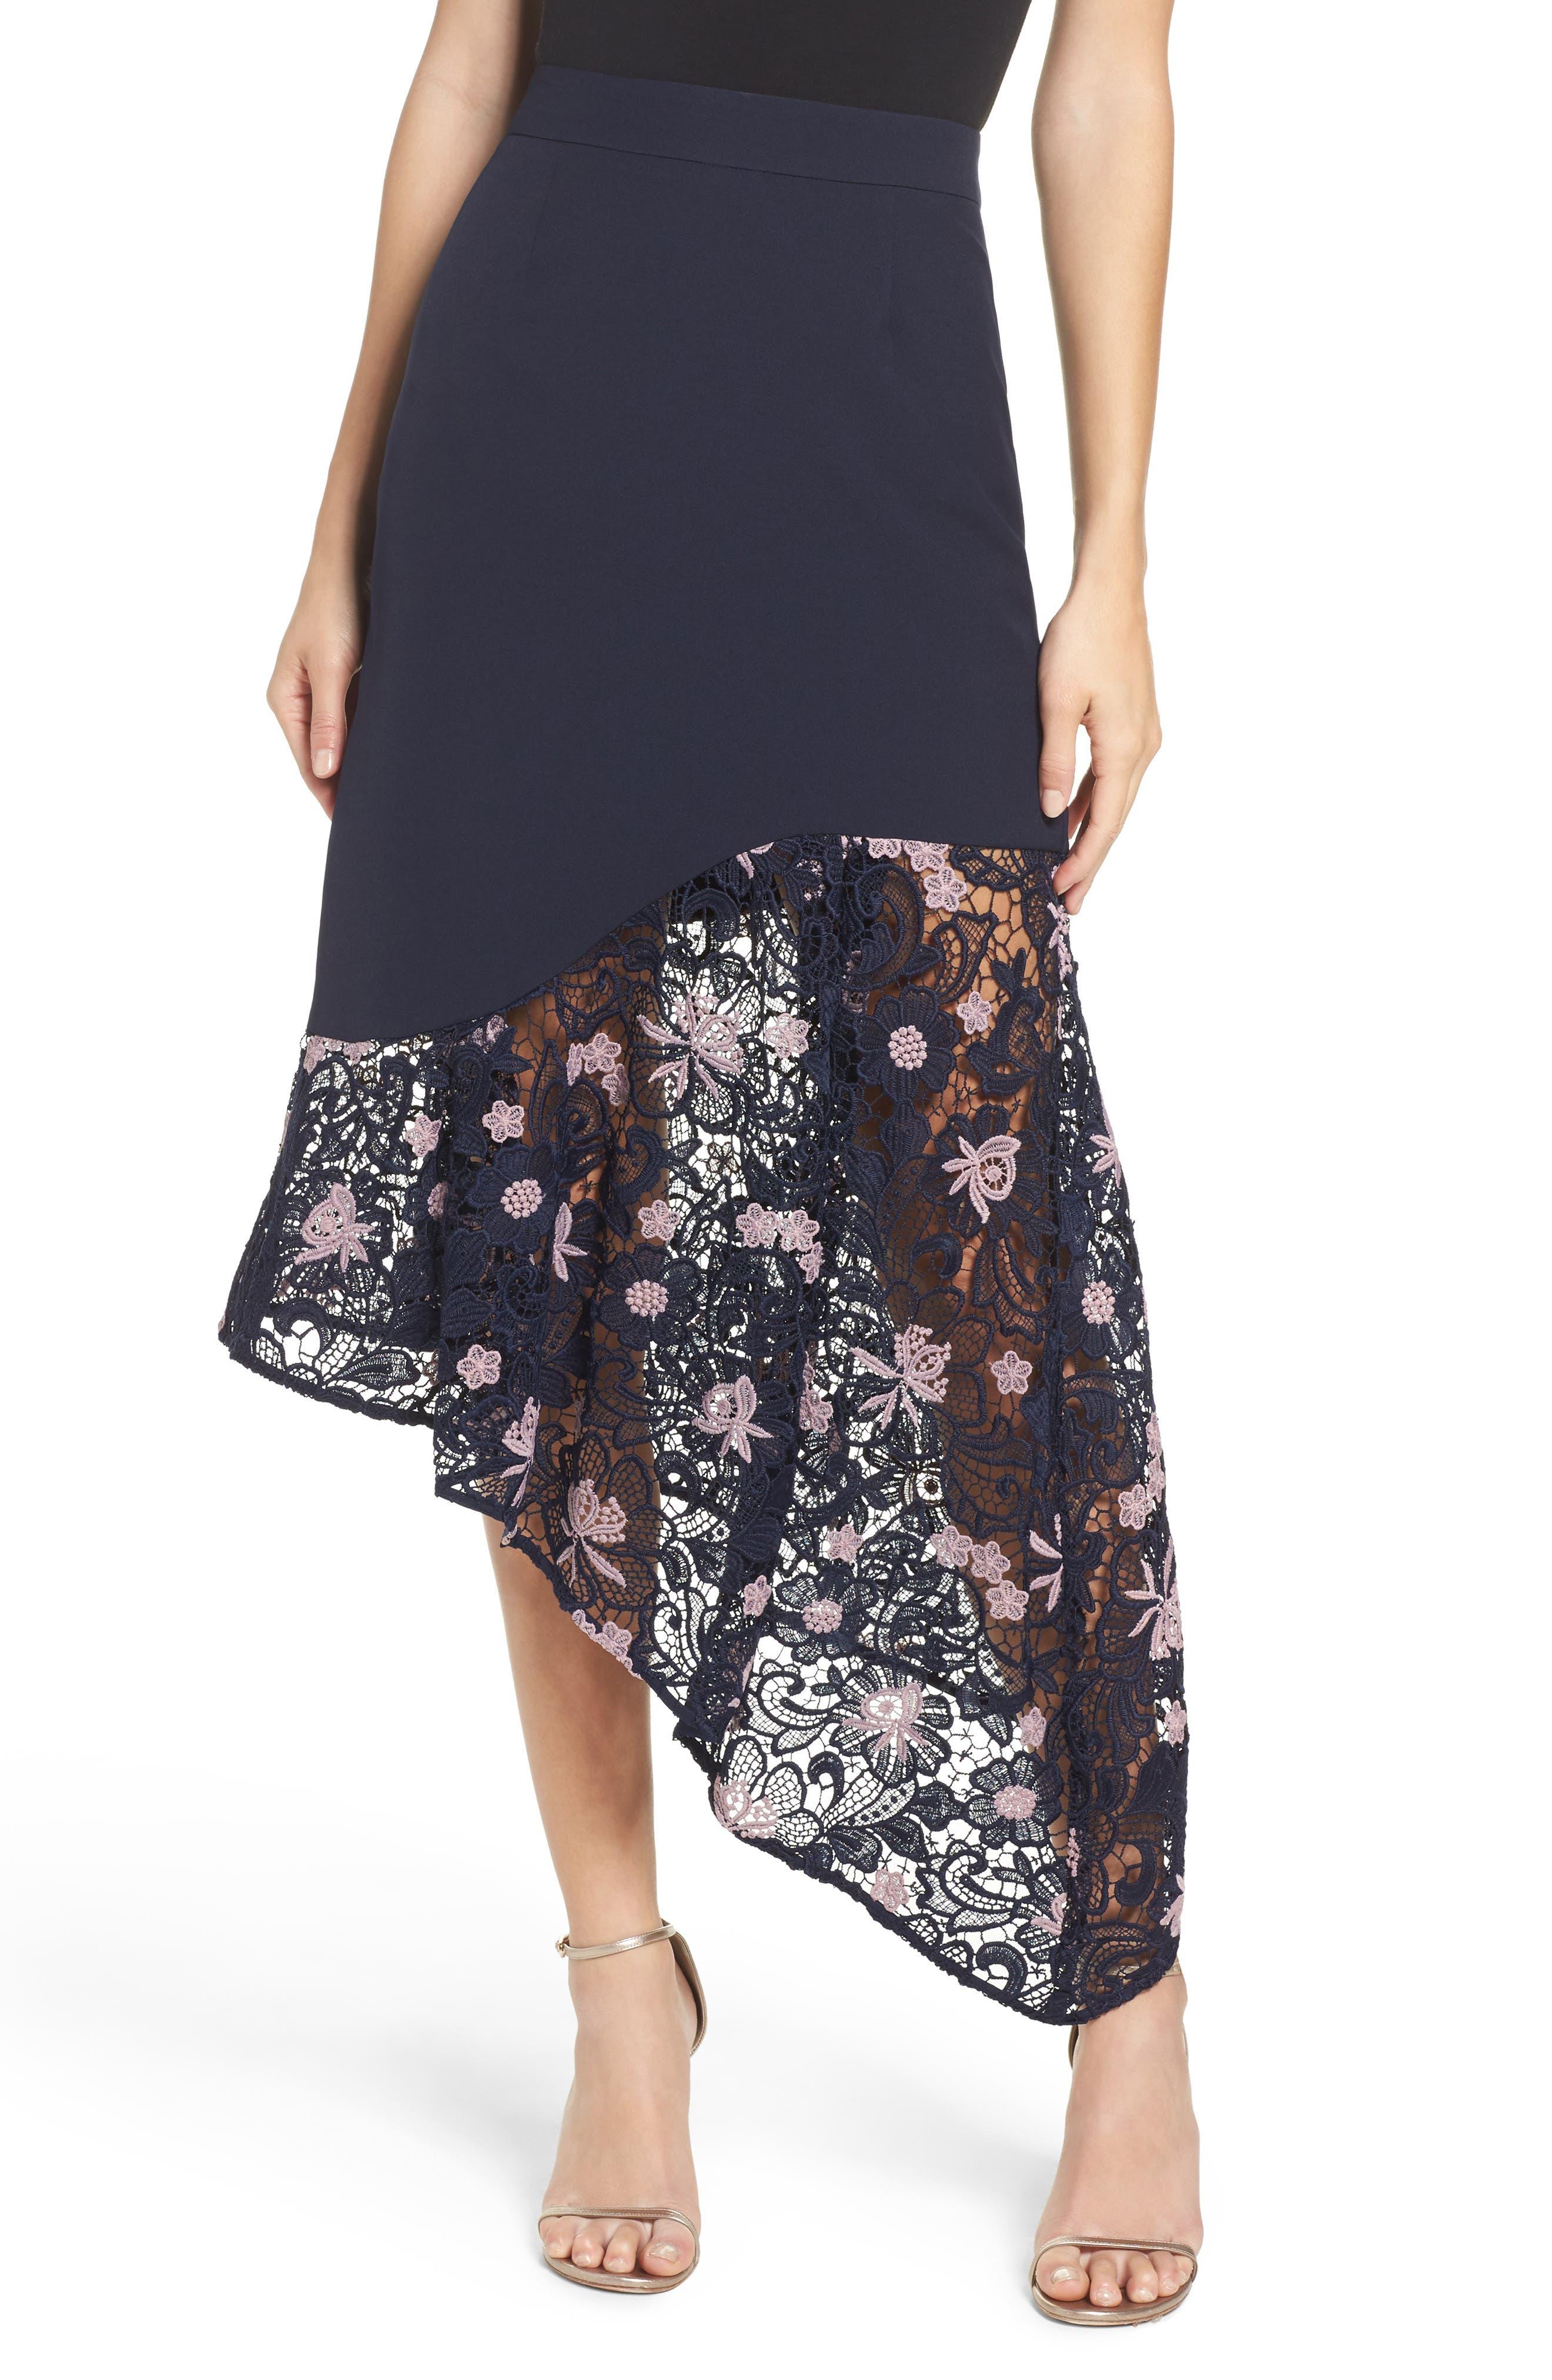 Alternate Image 1 Selected - Cooper St Botanic Bloom Lace Asymmetric Skirt